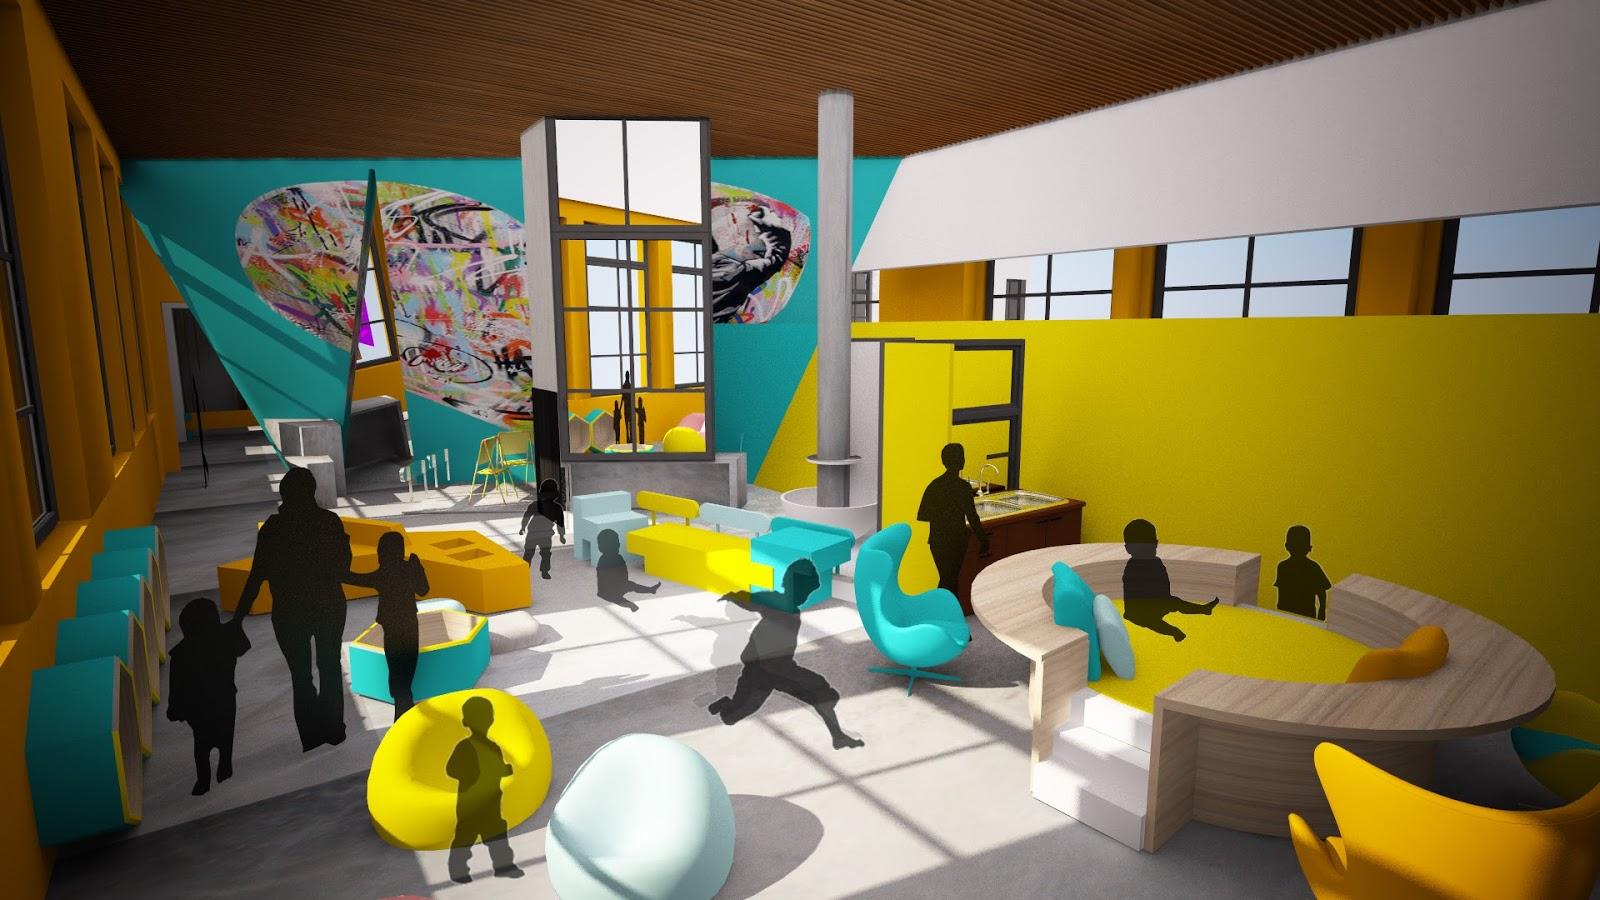 une cr che interg n rationnelle projet professionnel bts. Black Bedroom Furniture Sets. Home Design Ideas